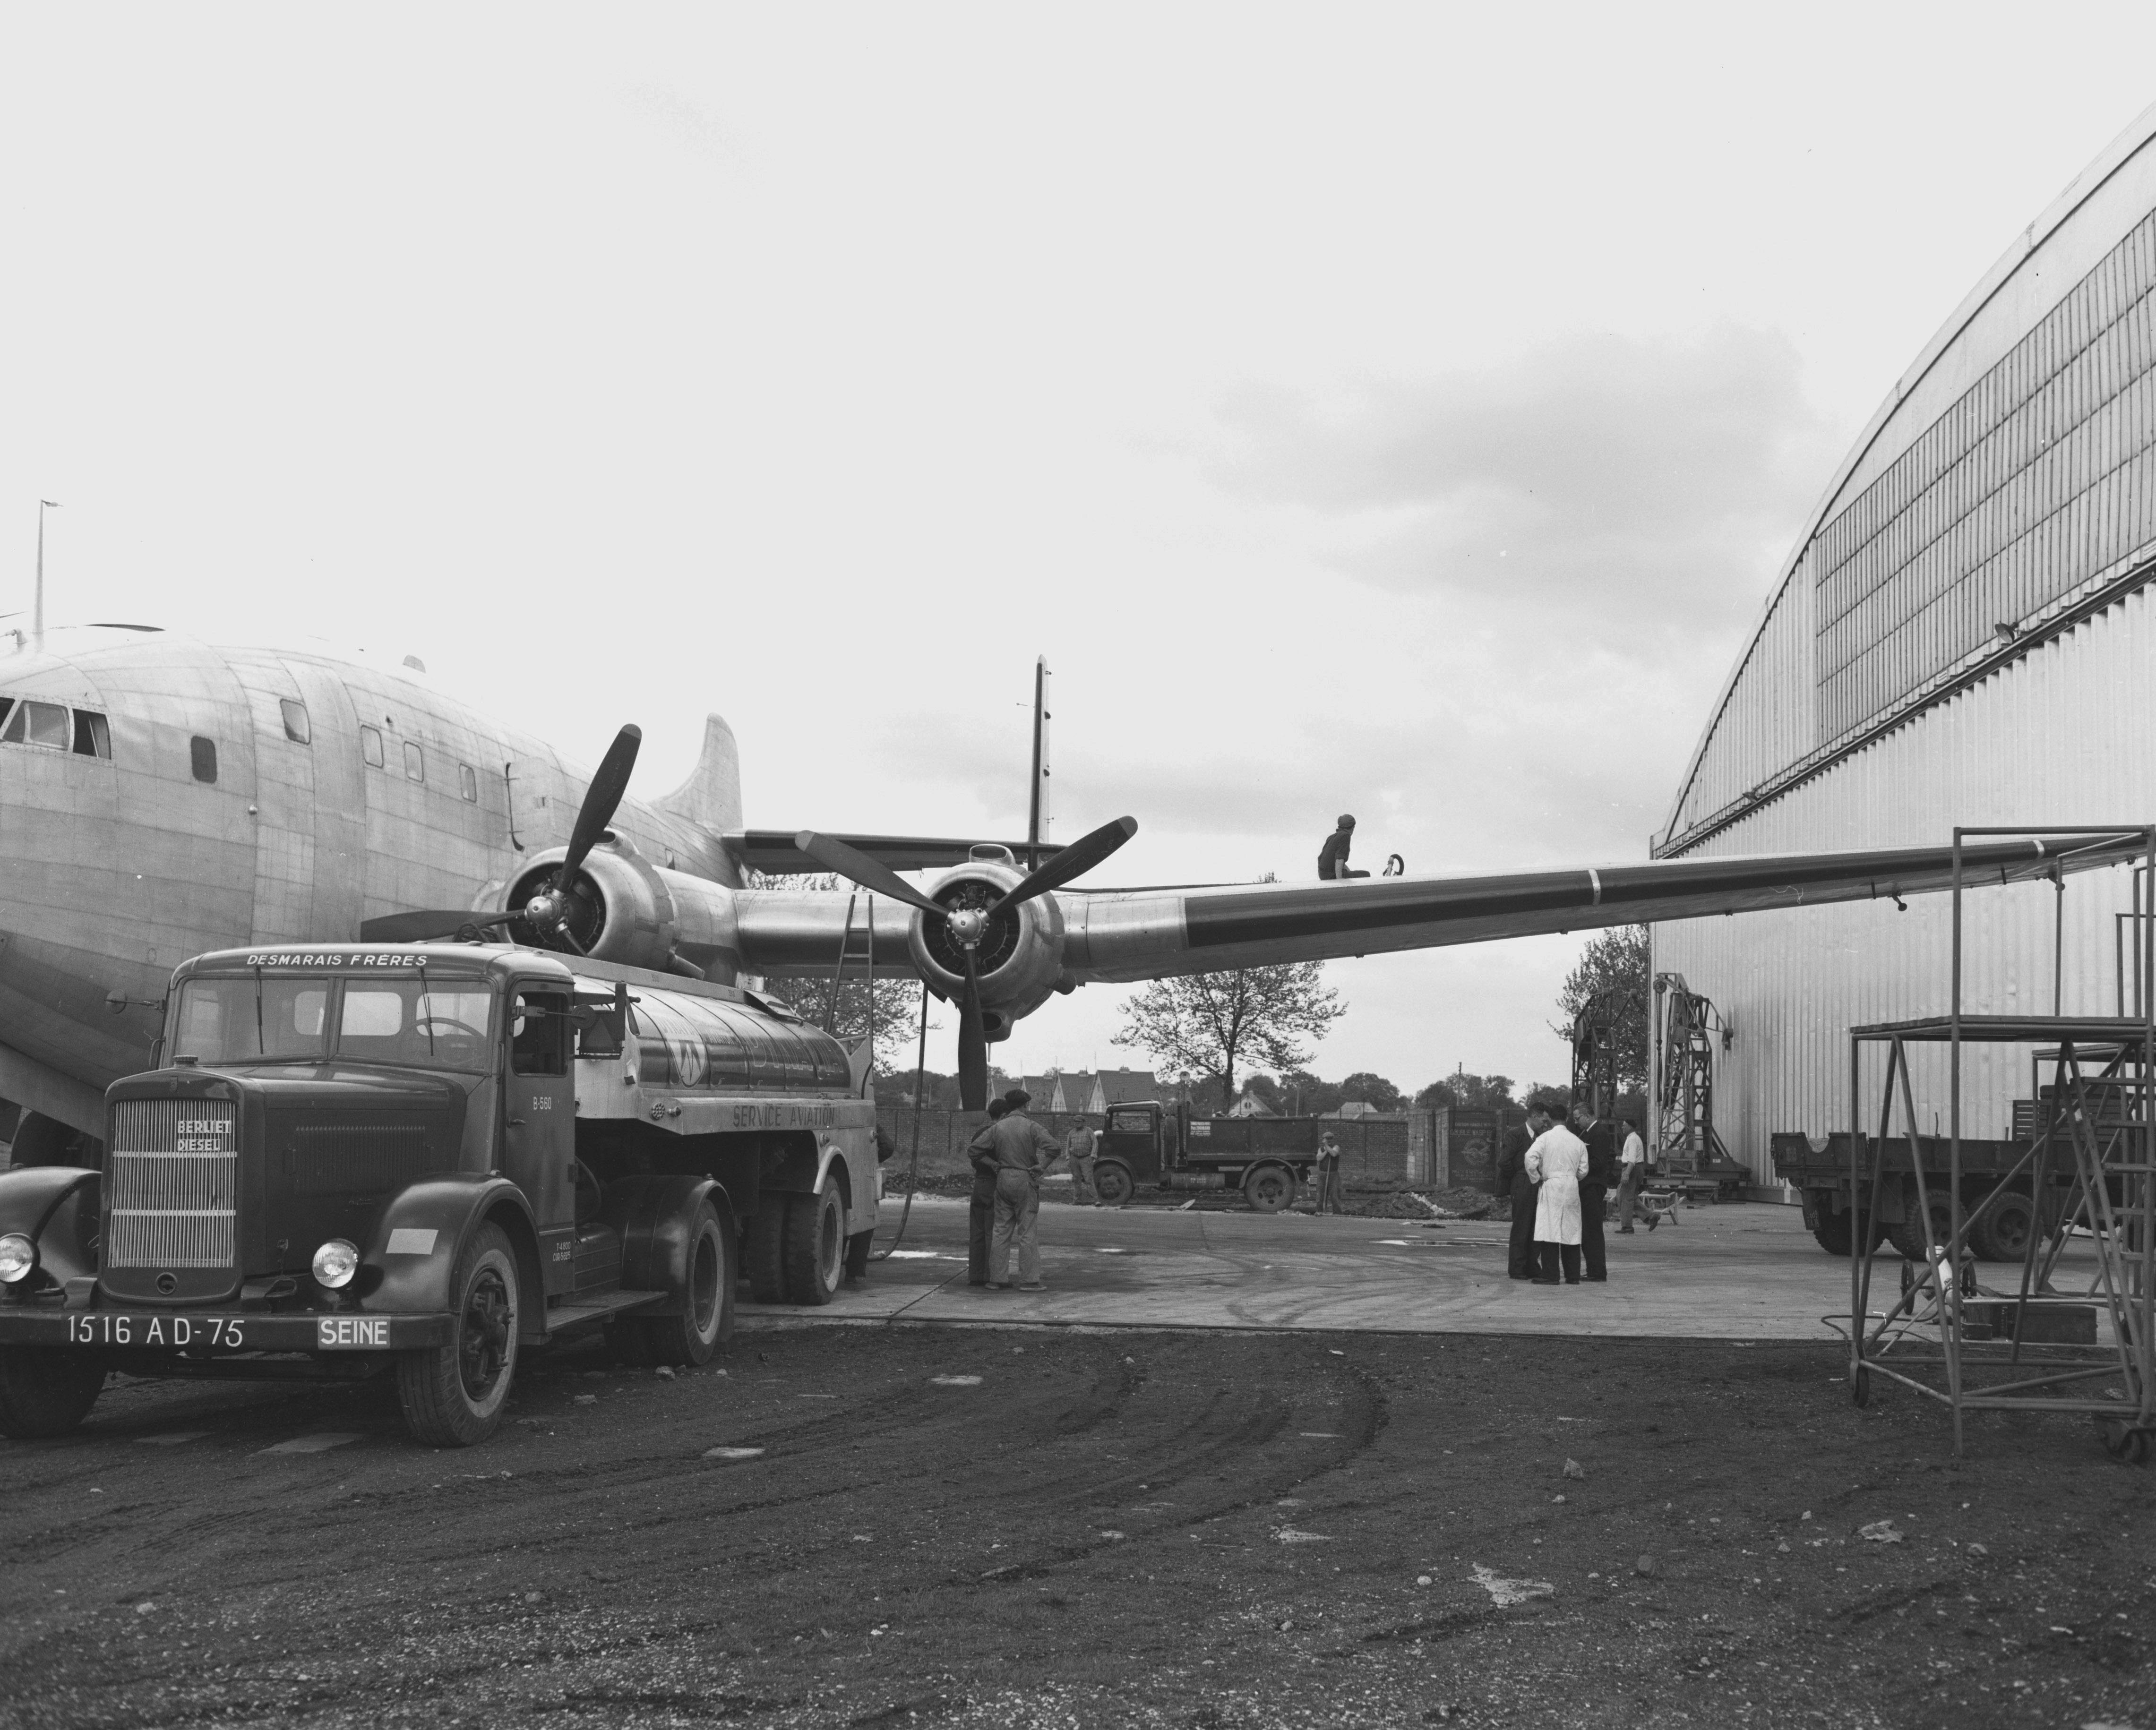 Louis Breguet, Ateliers d'Aviation